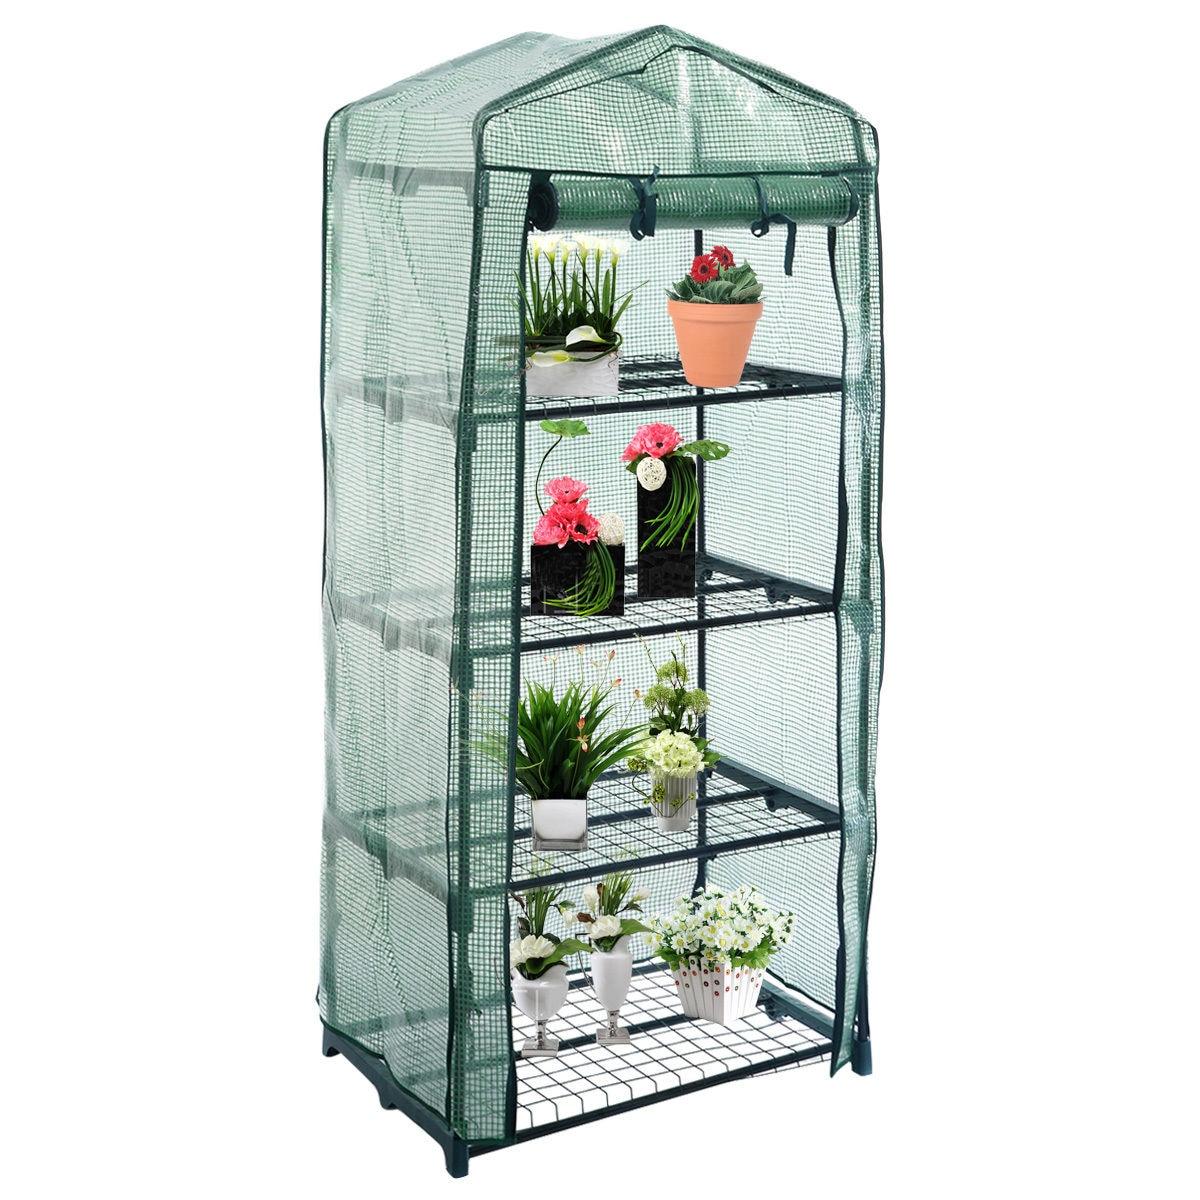 practical 4 tier outdoor garden greenhouse grow cold frame wshelving reinforced cvers